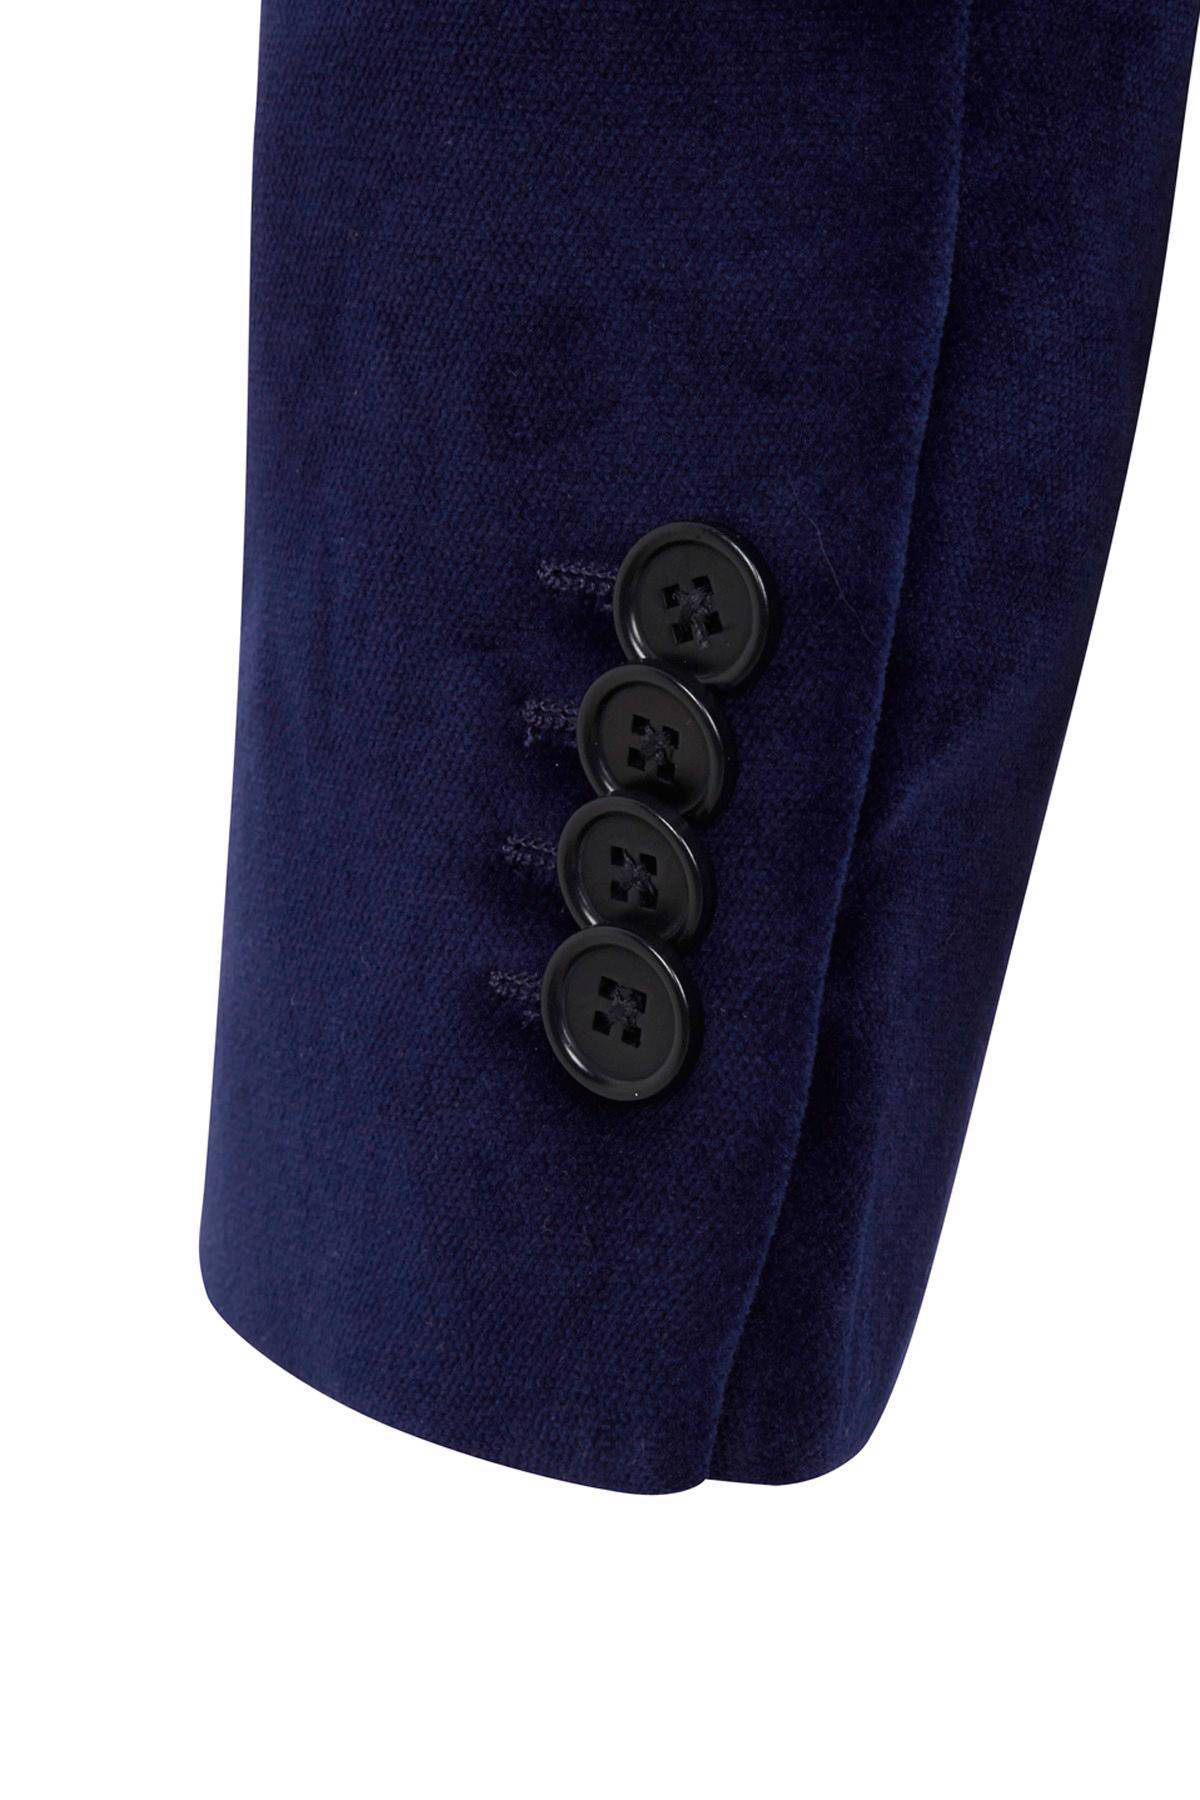 velours blazer